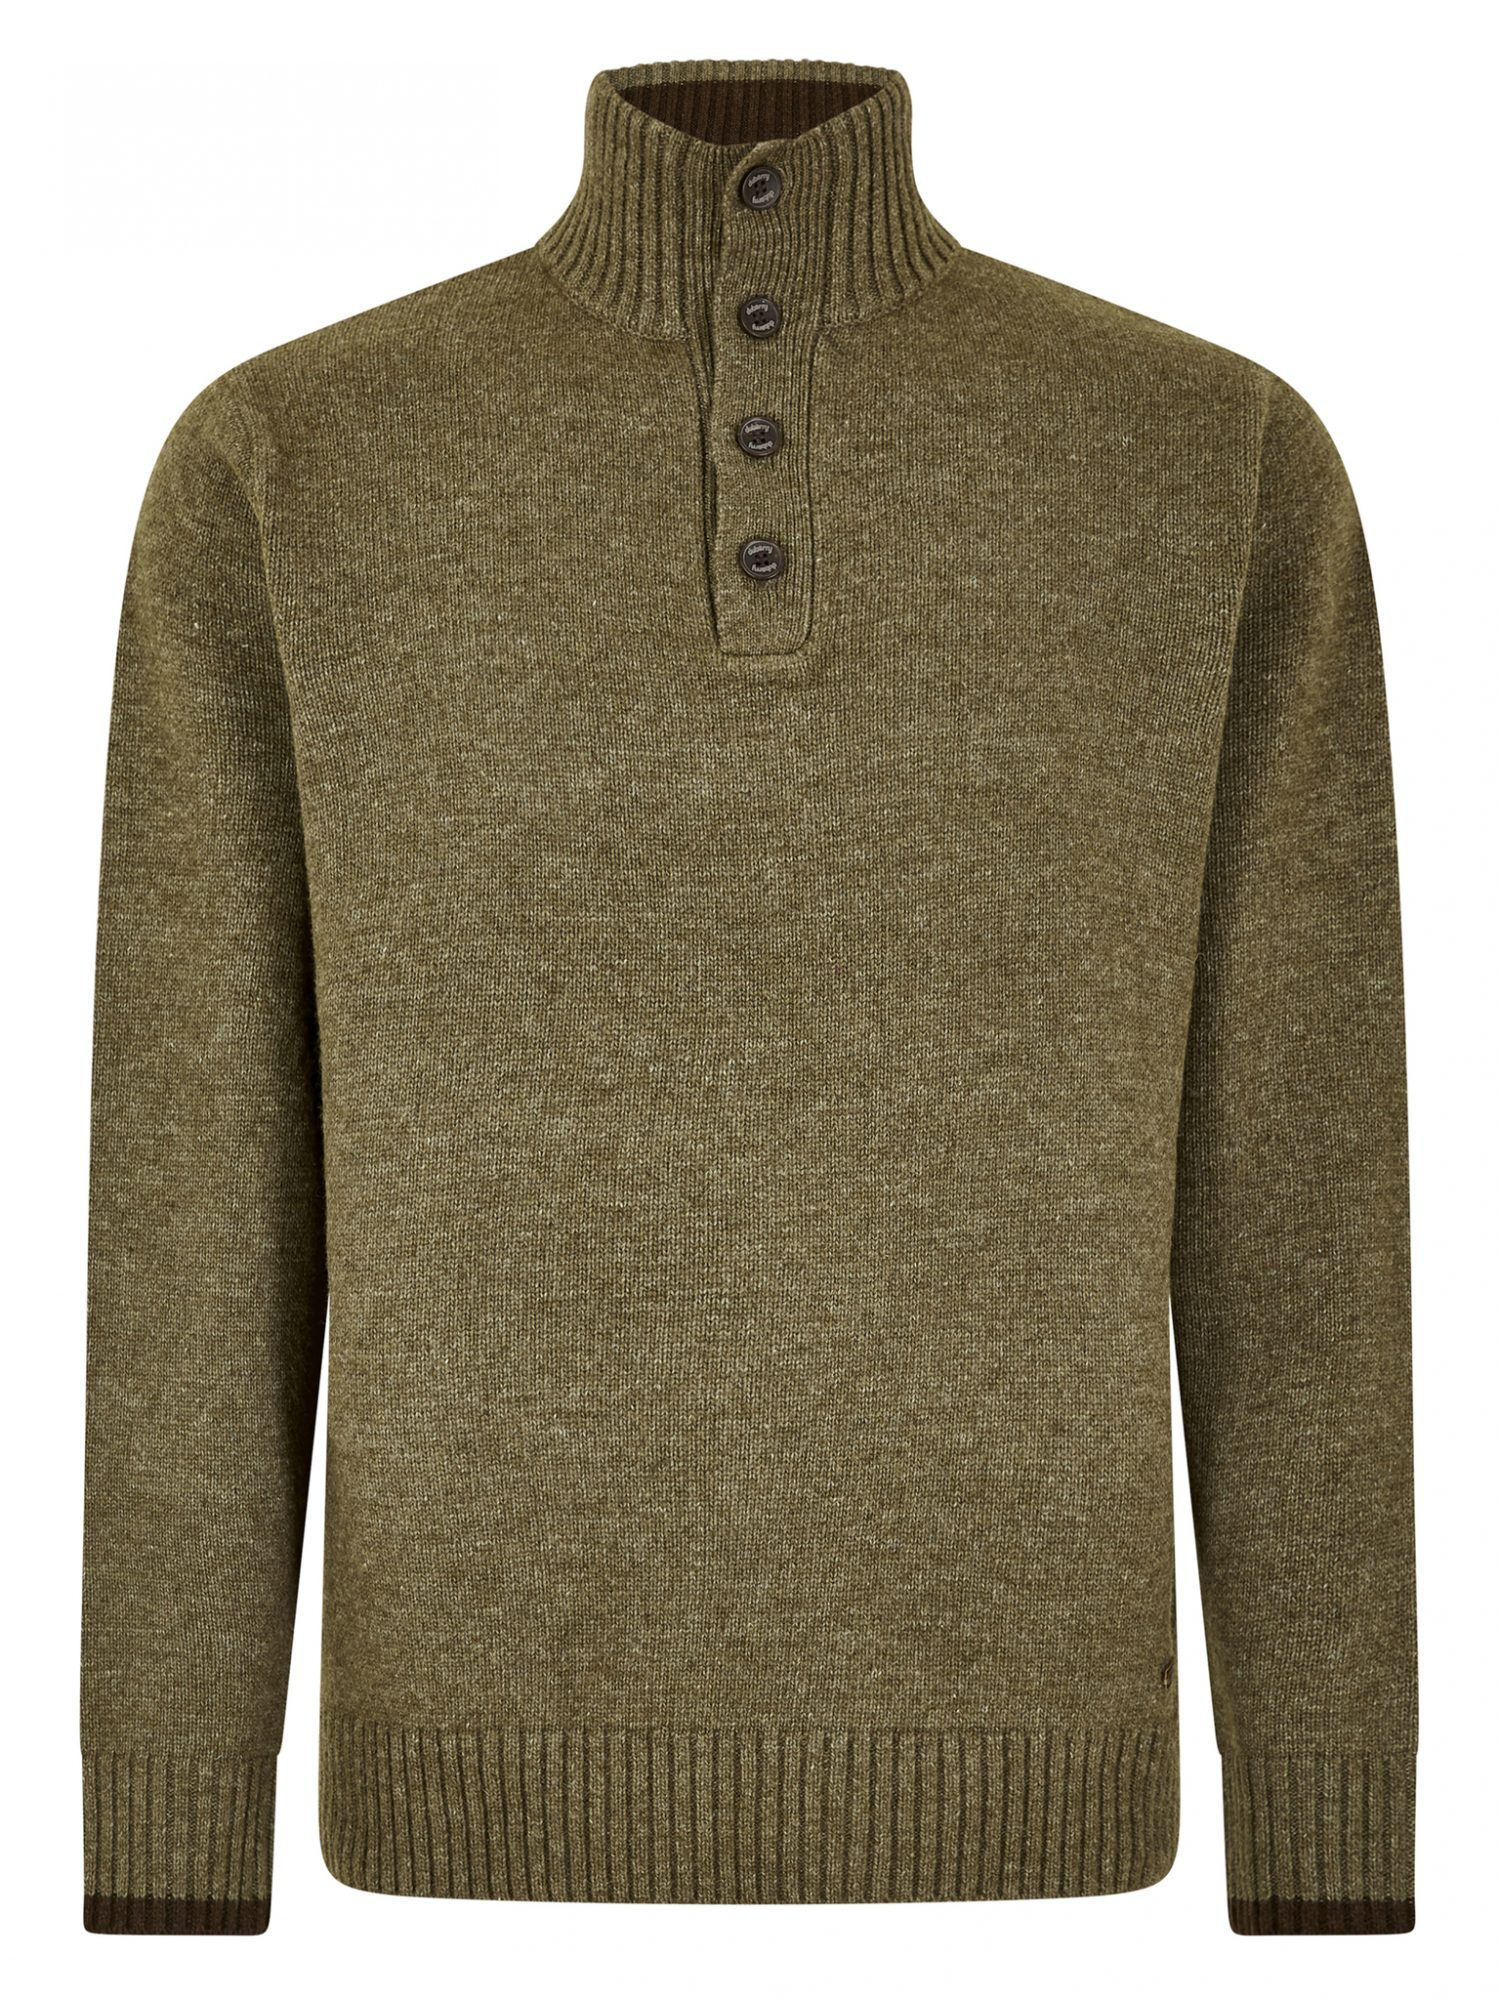 Dubarry-hughes-sweater-dusky-green